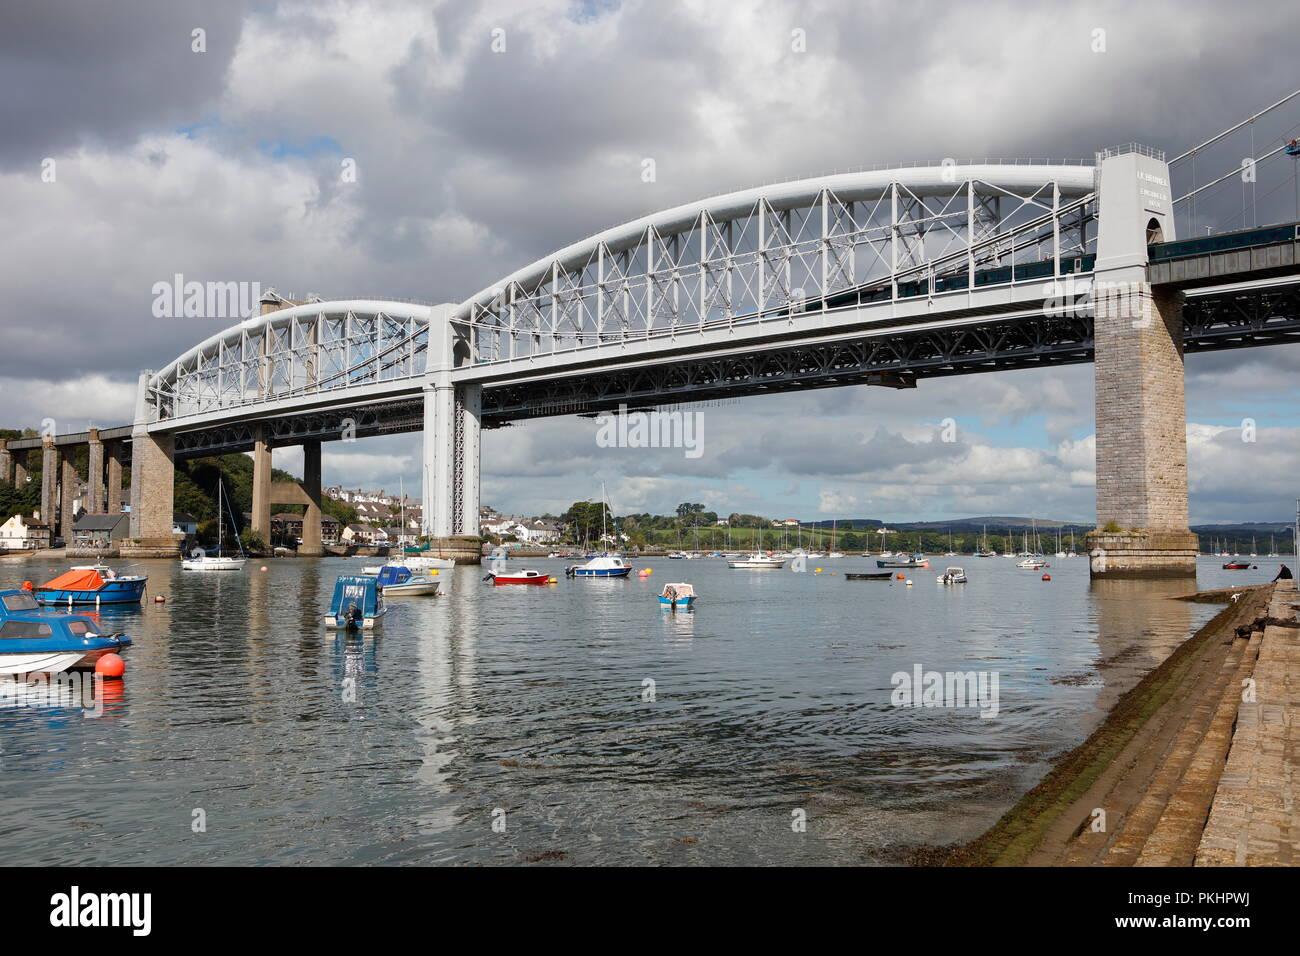 Plymouth, Devon, UK. 13th September, 2018. The Royal Albert and Tamar bridges spanning the River Tamar between Cornwall and Devon. The Royal Albert Br Stock Photo